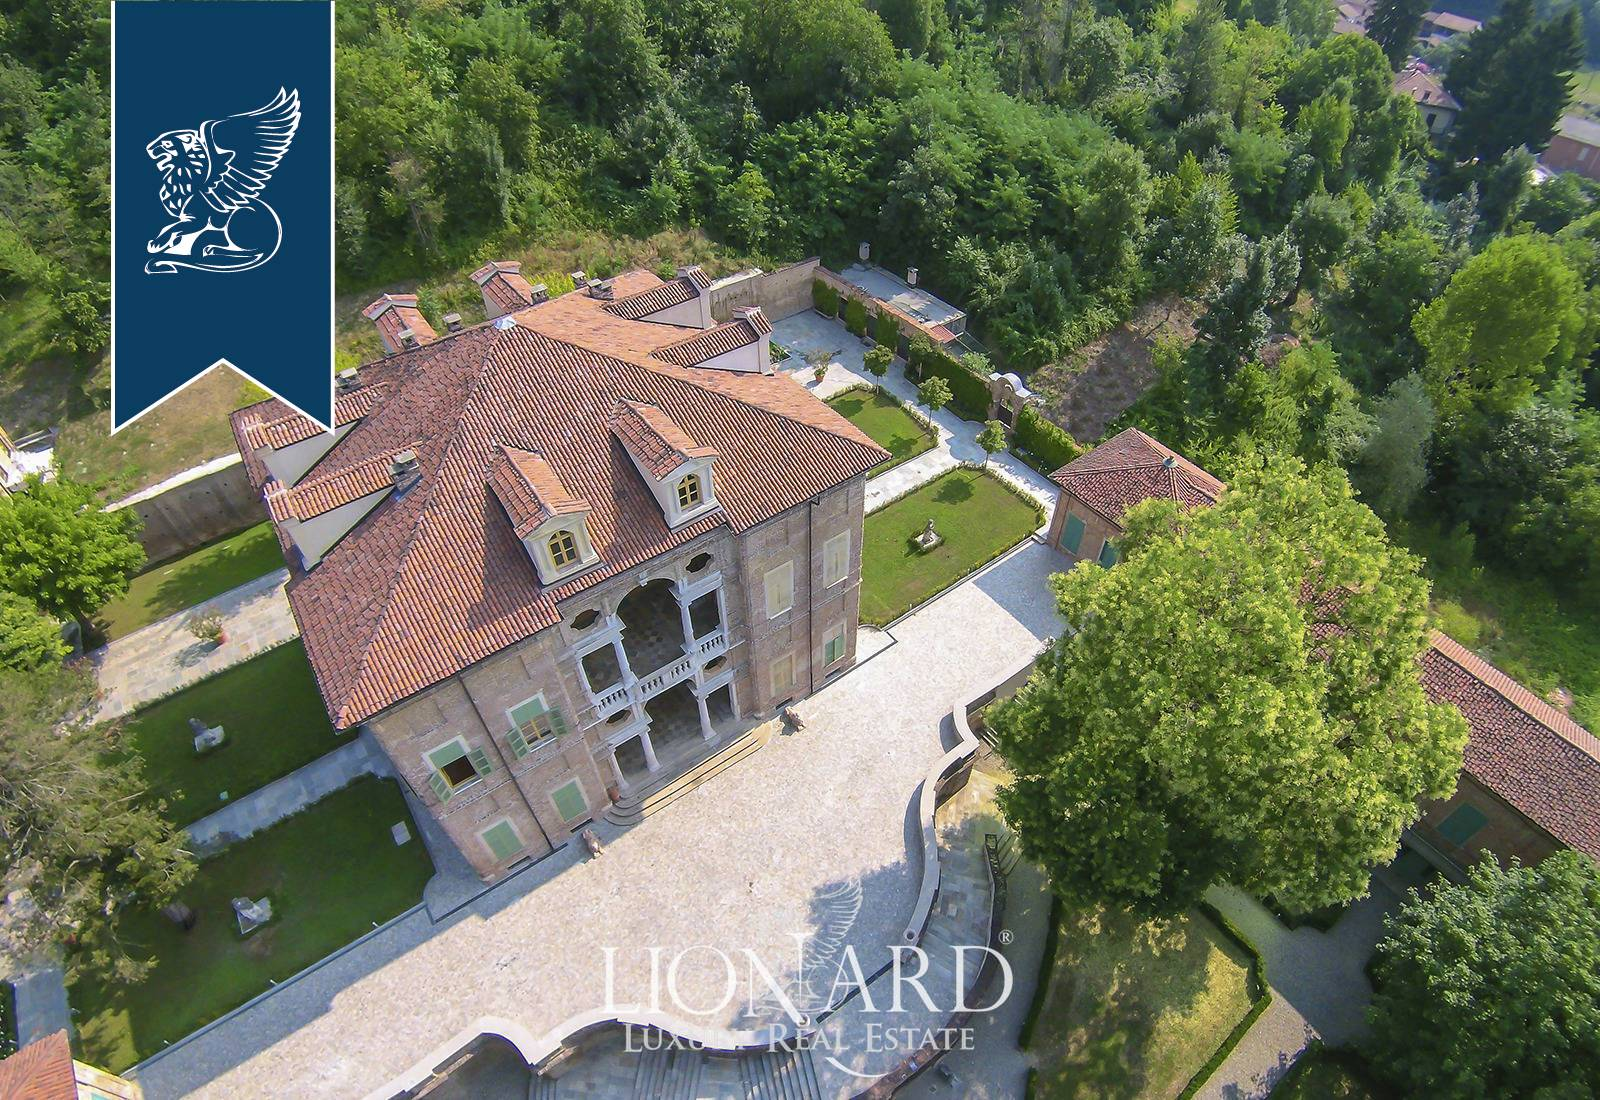 Villa in Vendita a Gassino Torinese: 0 locali, 2000 mq - Foto 3